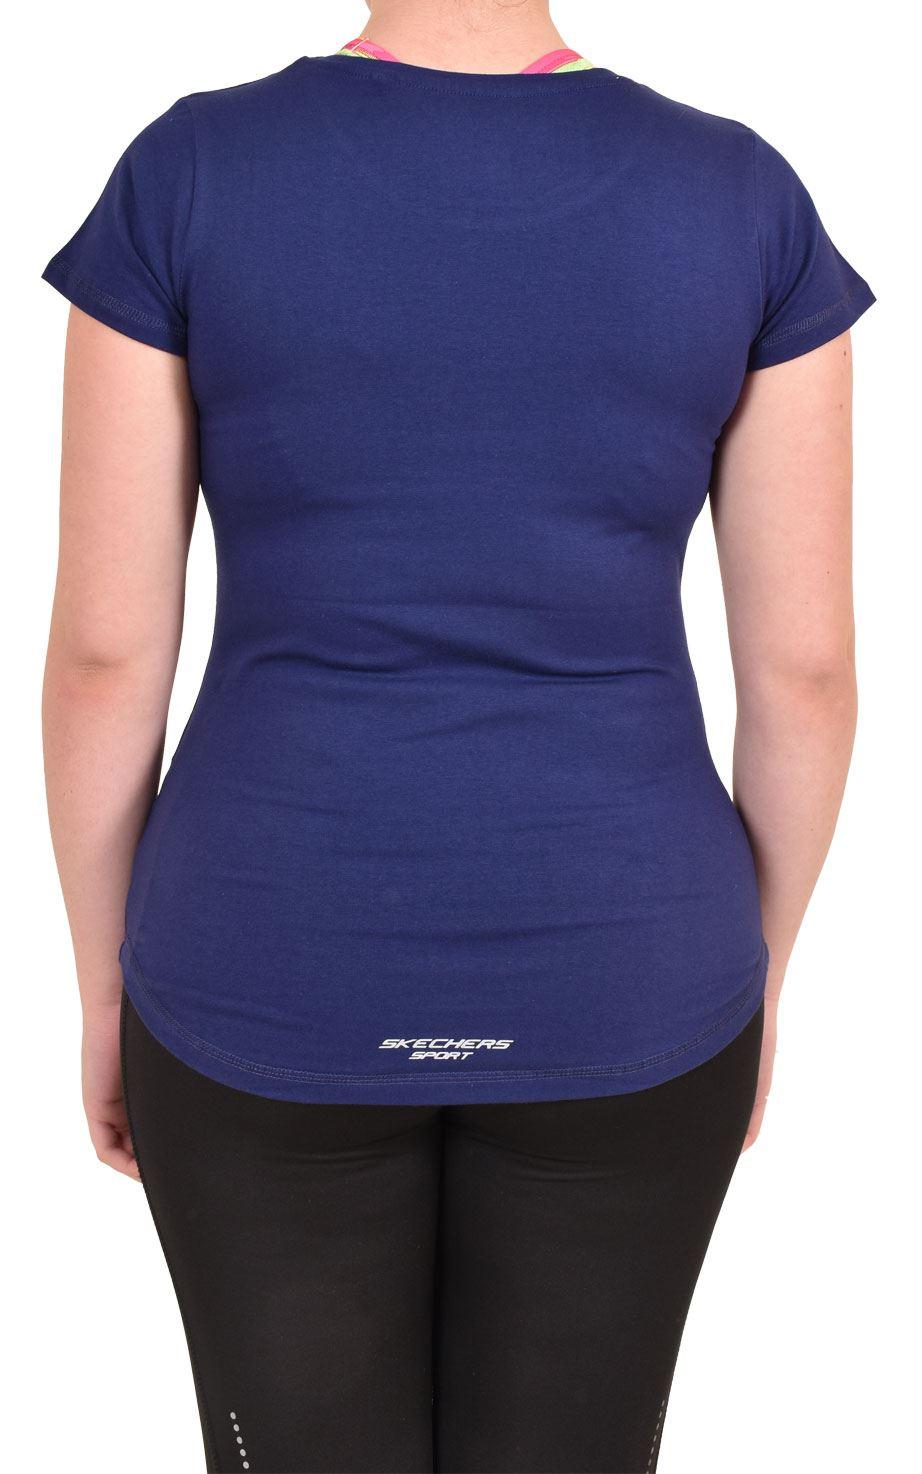 Camiseta-Para-Mujer-Elastico-Damas-Deportes-Skechers-Top-Secado-Rapido-Baile-Fitness-Gym miniatura 9